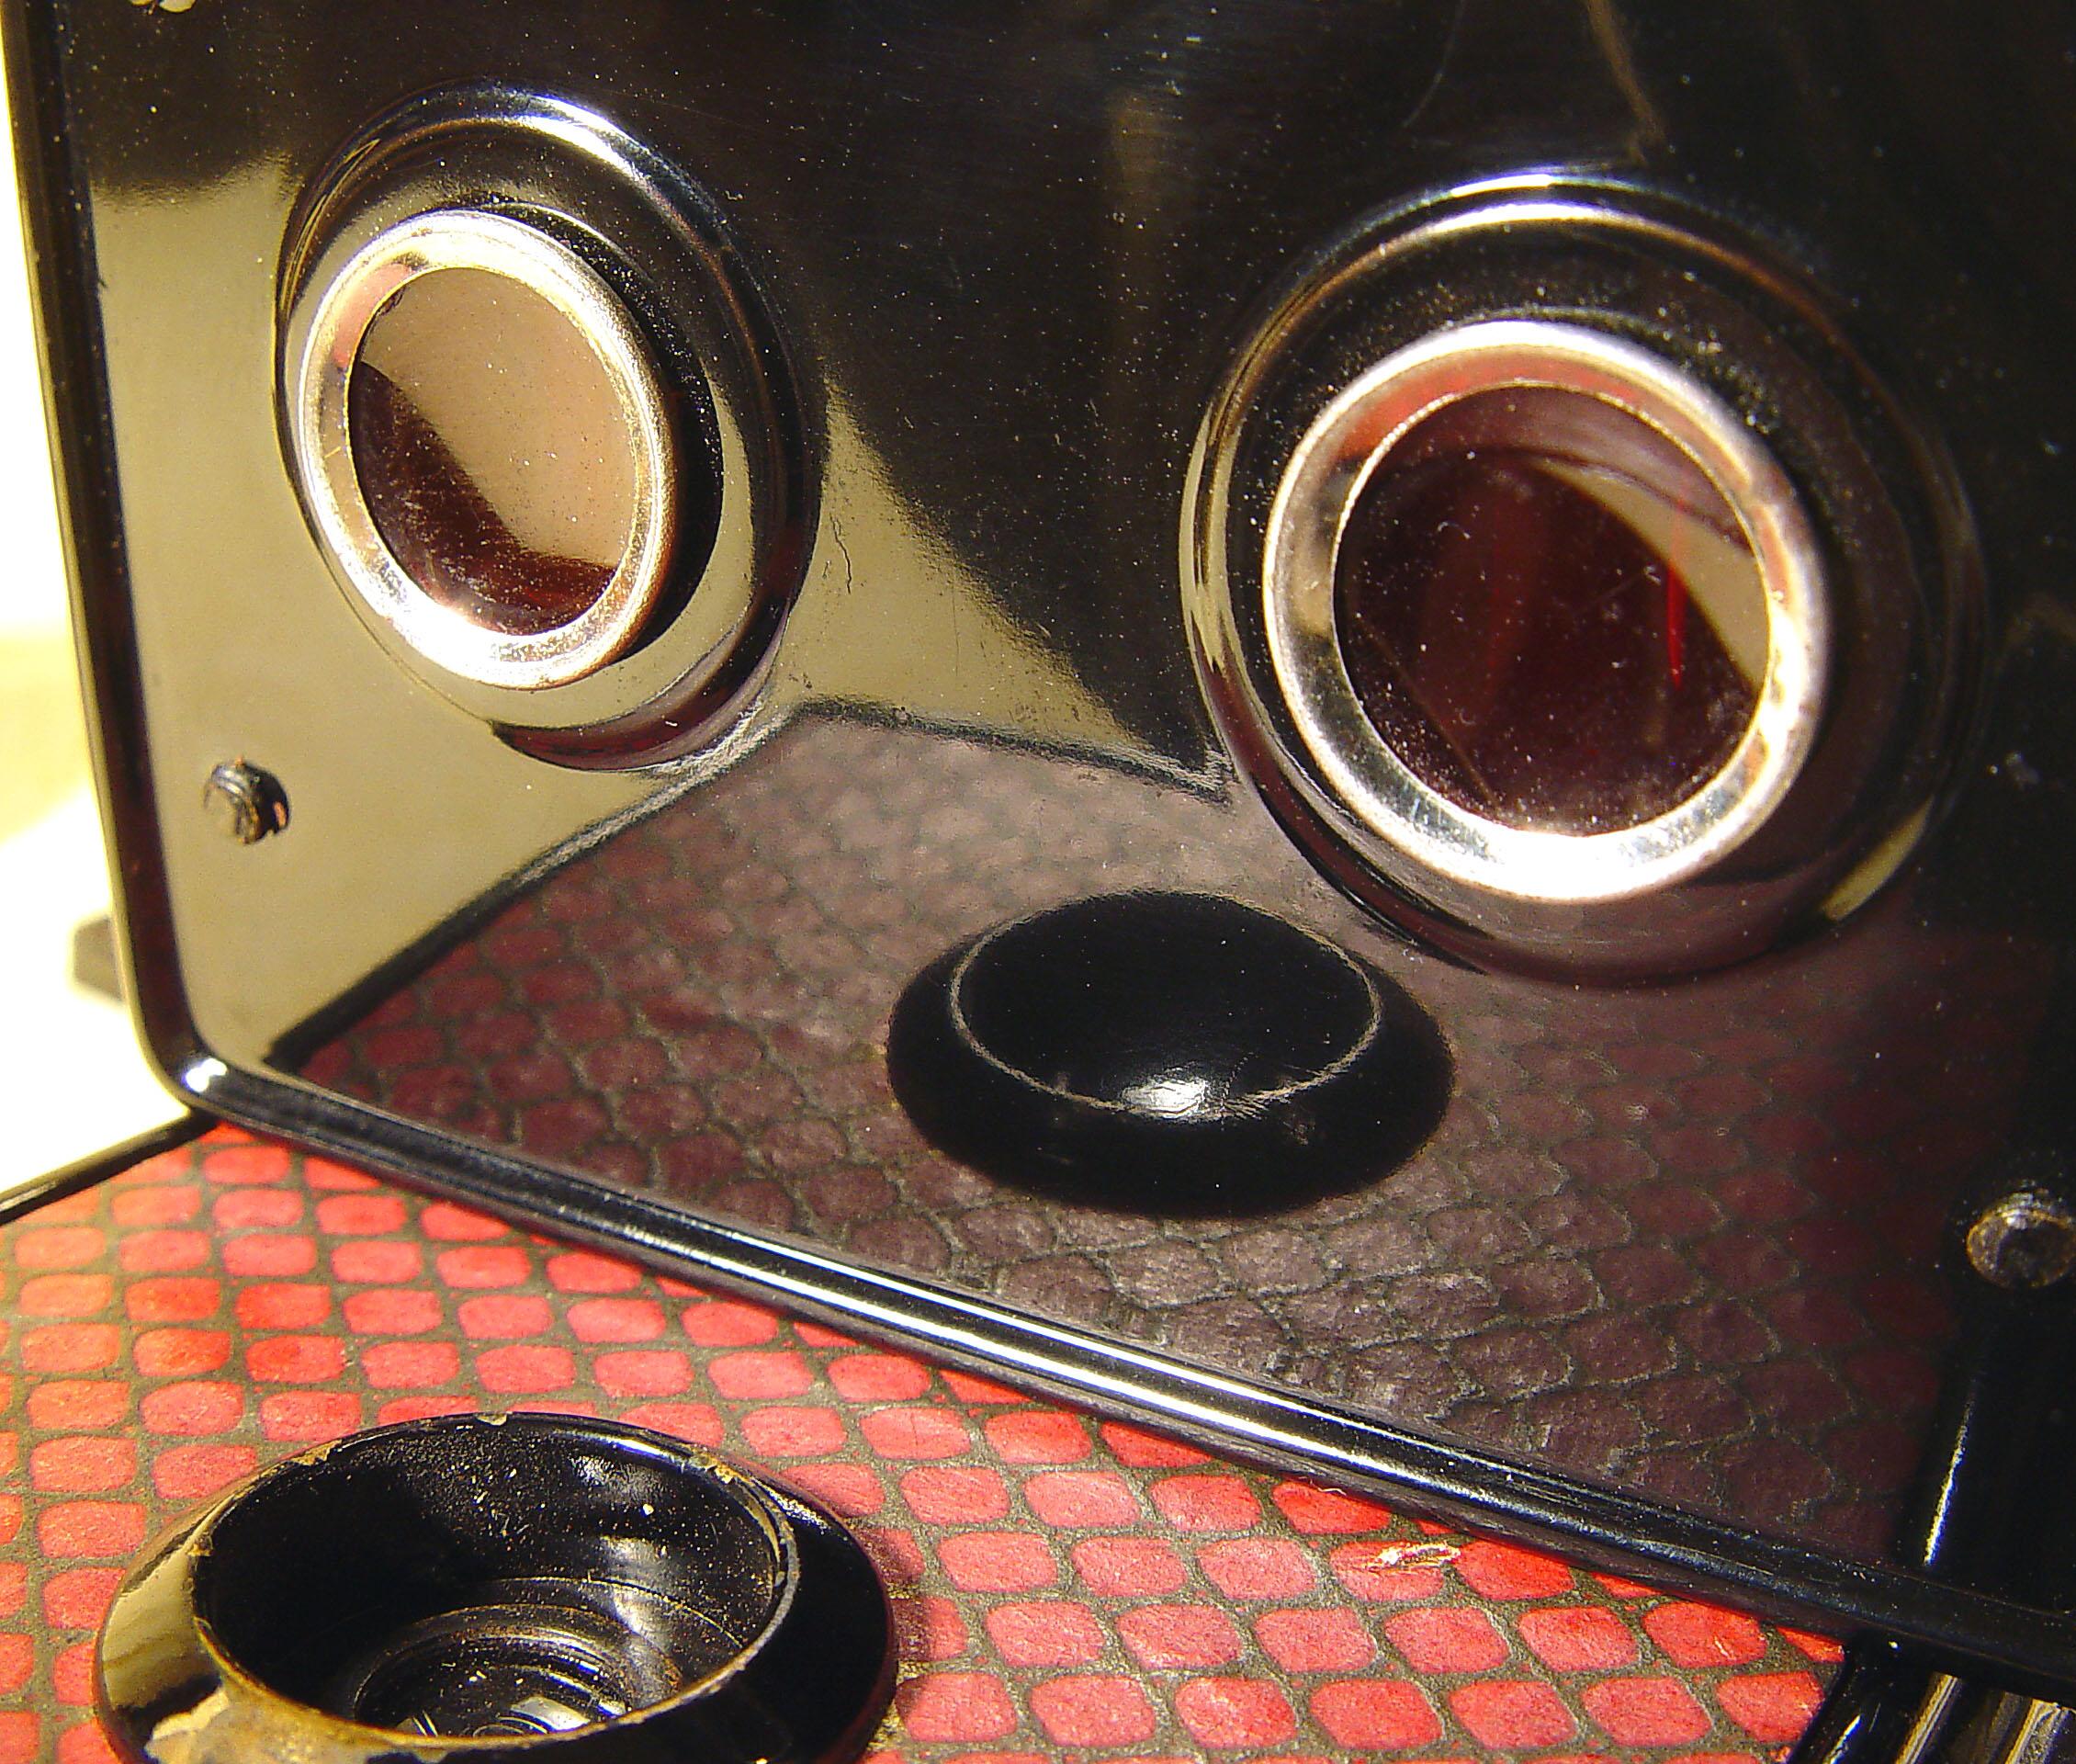 Wallpaper Appareils photos 2273-12  GAP  box  3X4 facade losangee rouge et or